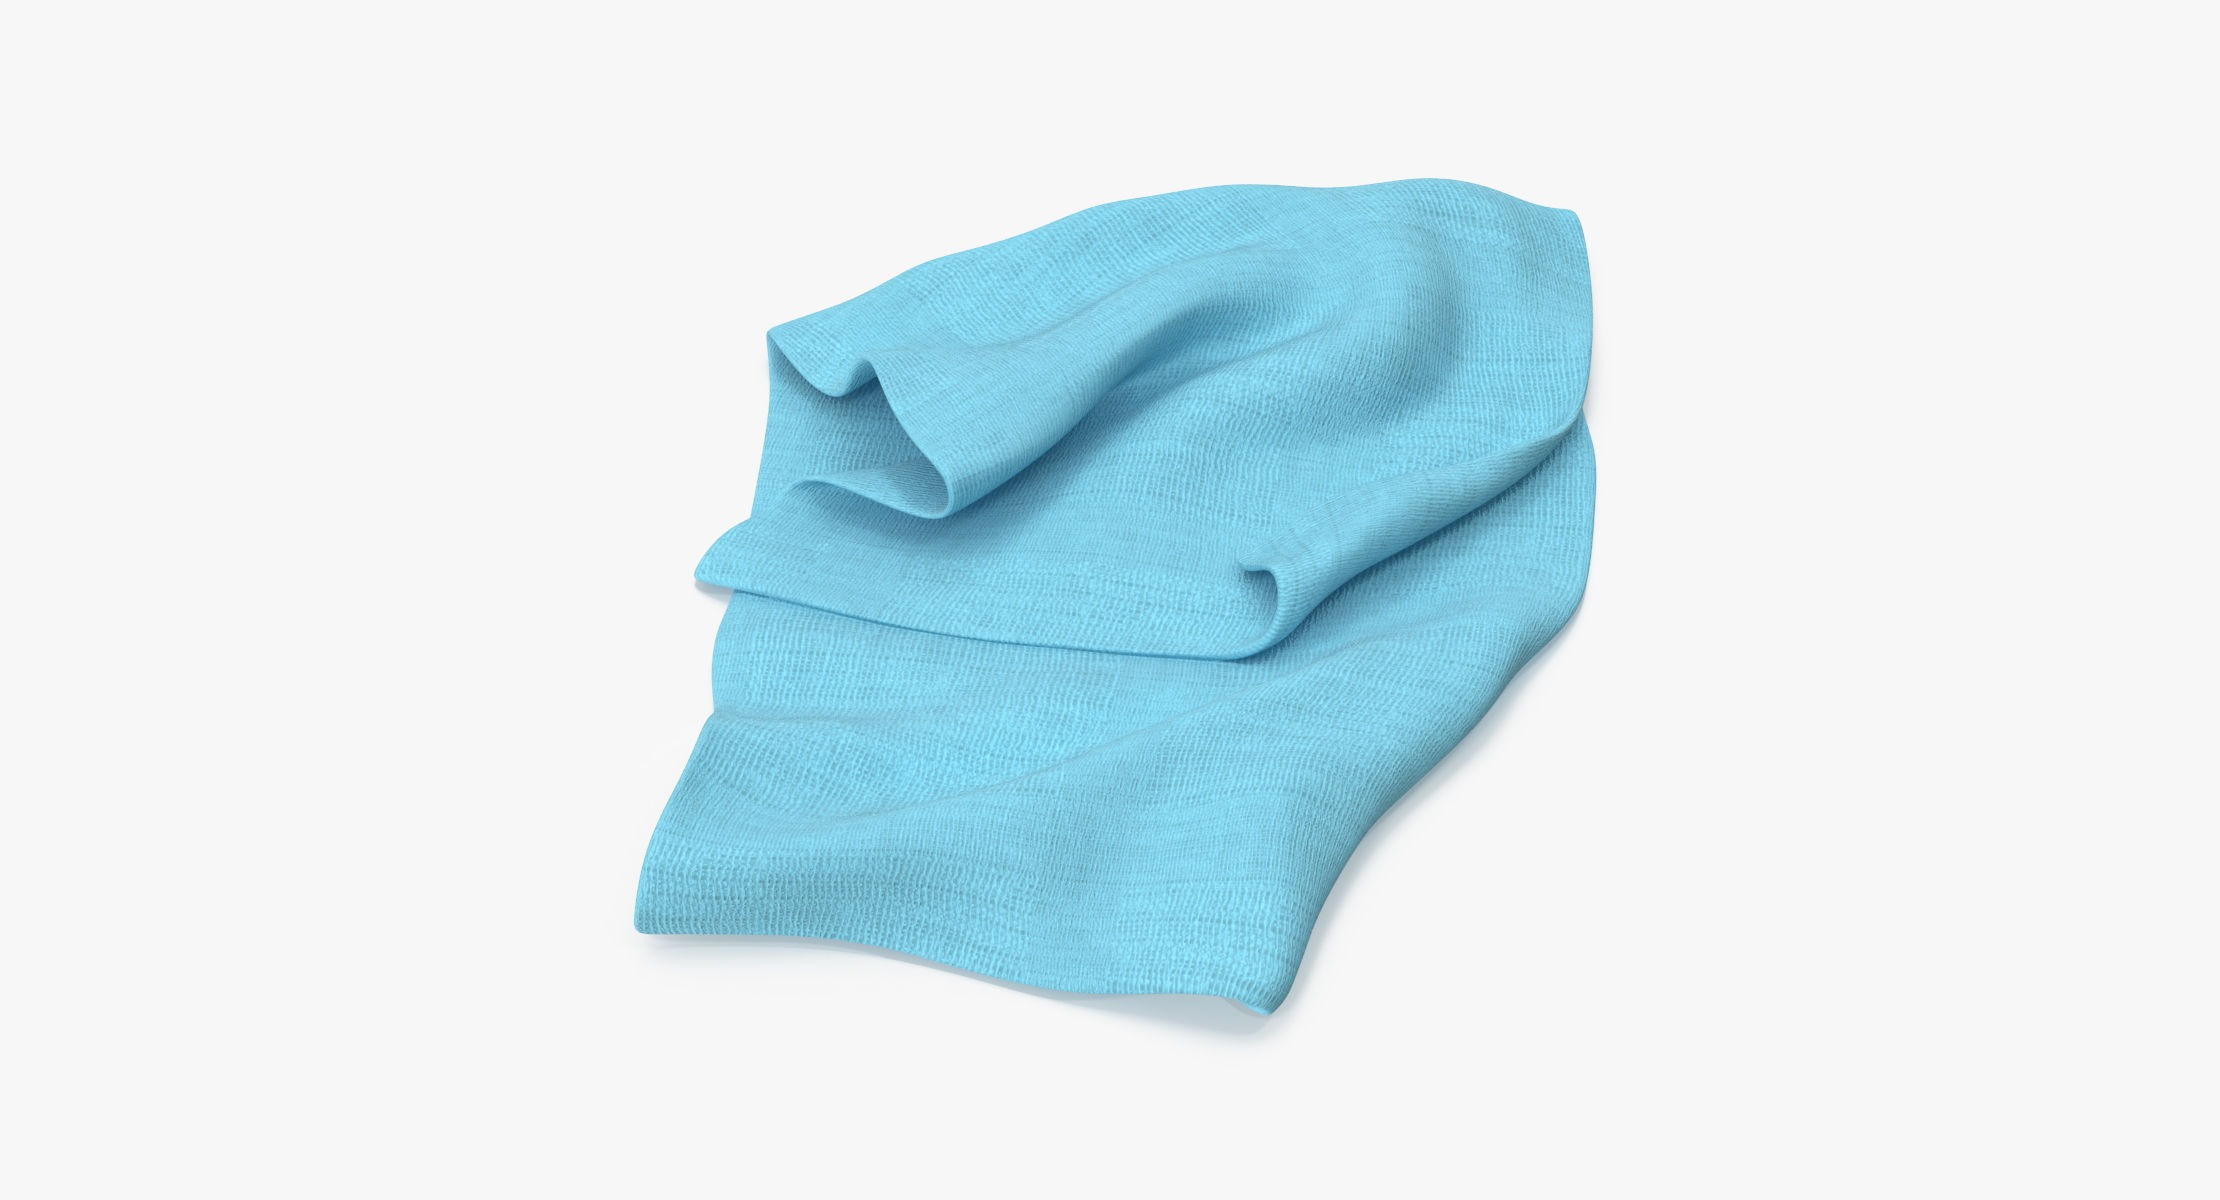 Baby Blankets 01 03 - reel 1